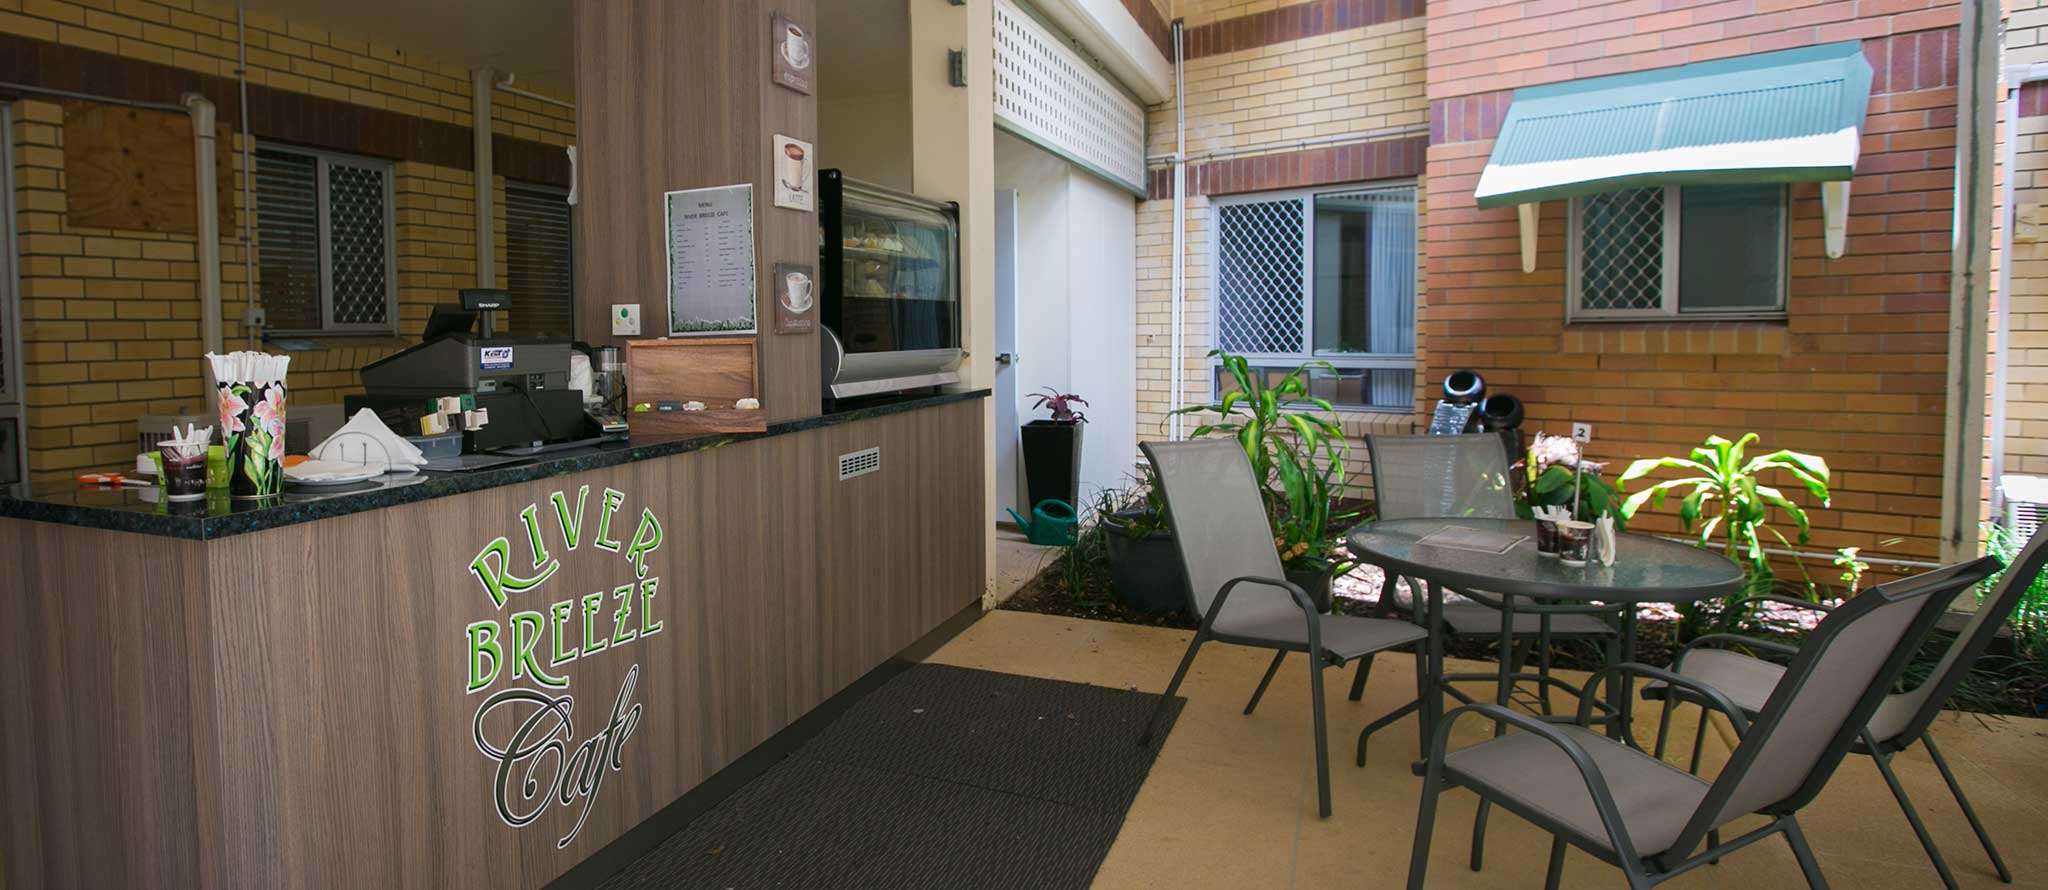 Bethesda Caring Centre, Corinda QLD 4075 - Bethesda Caring Centre